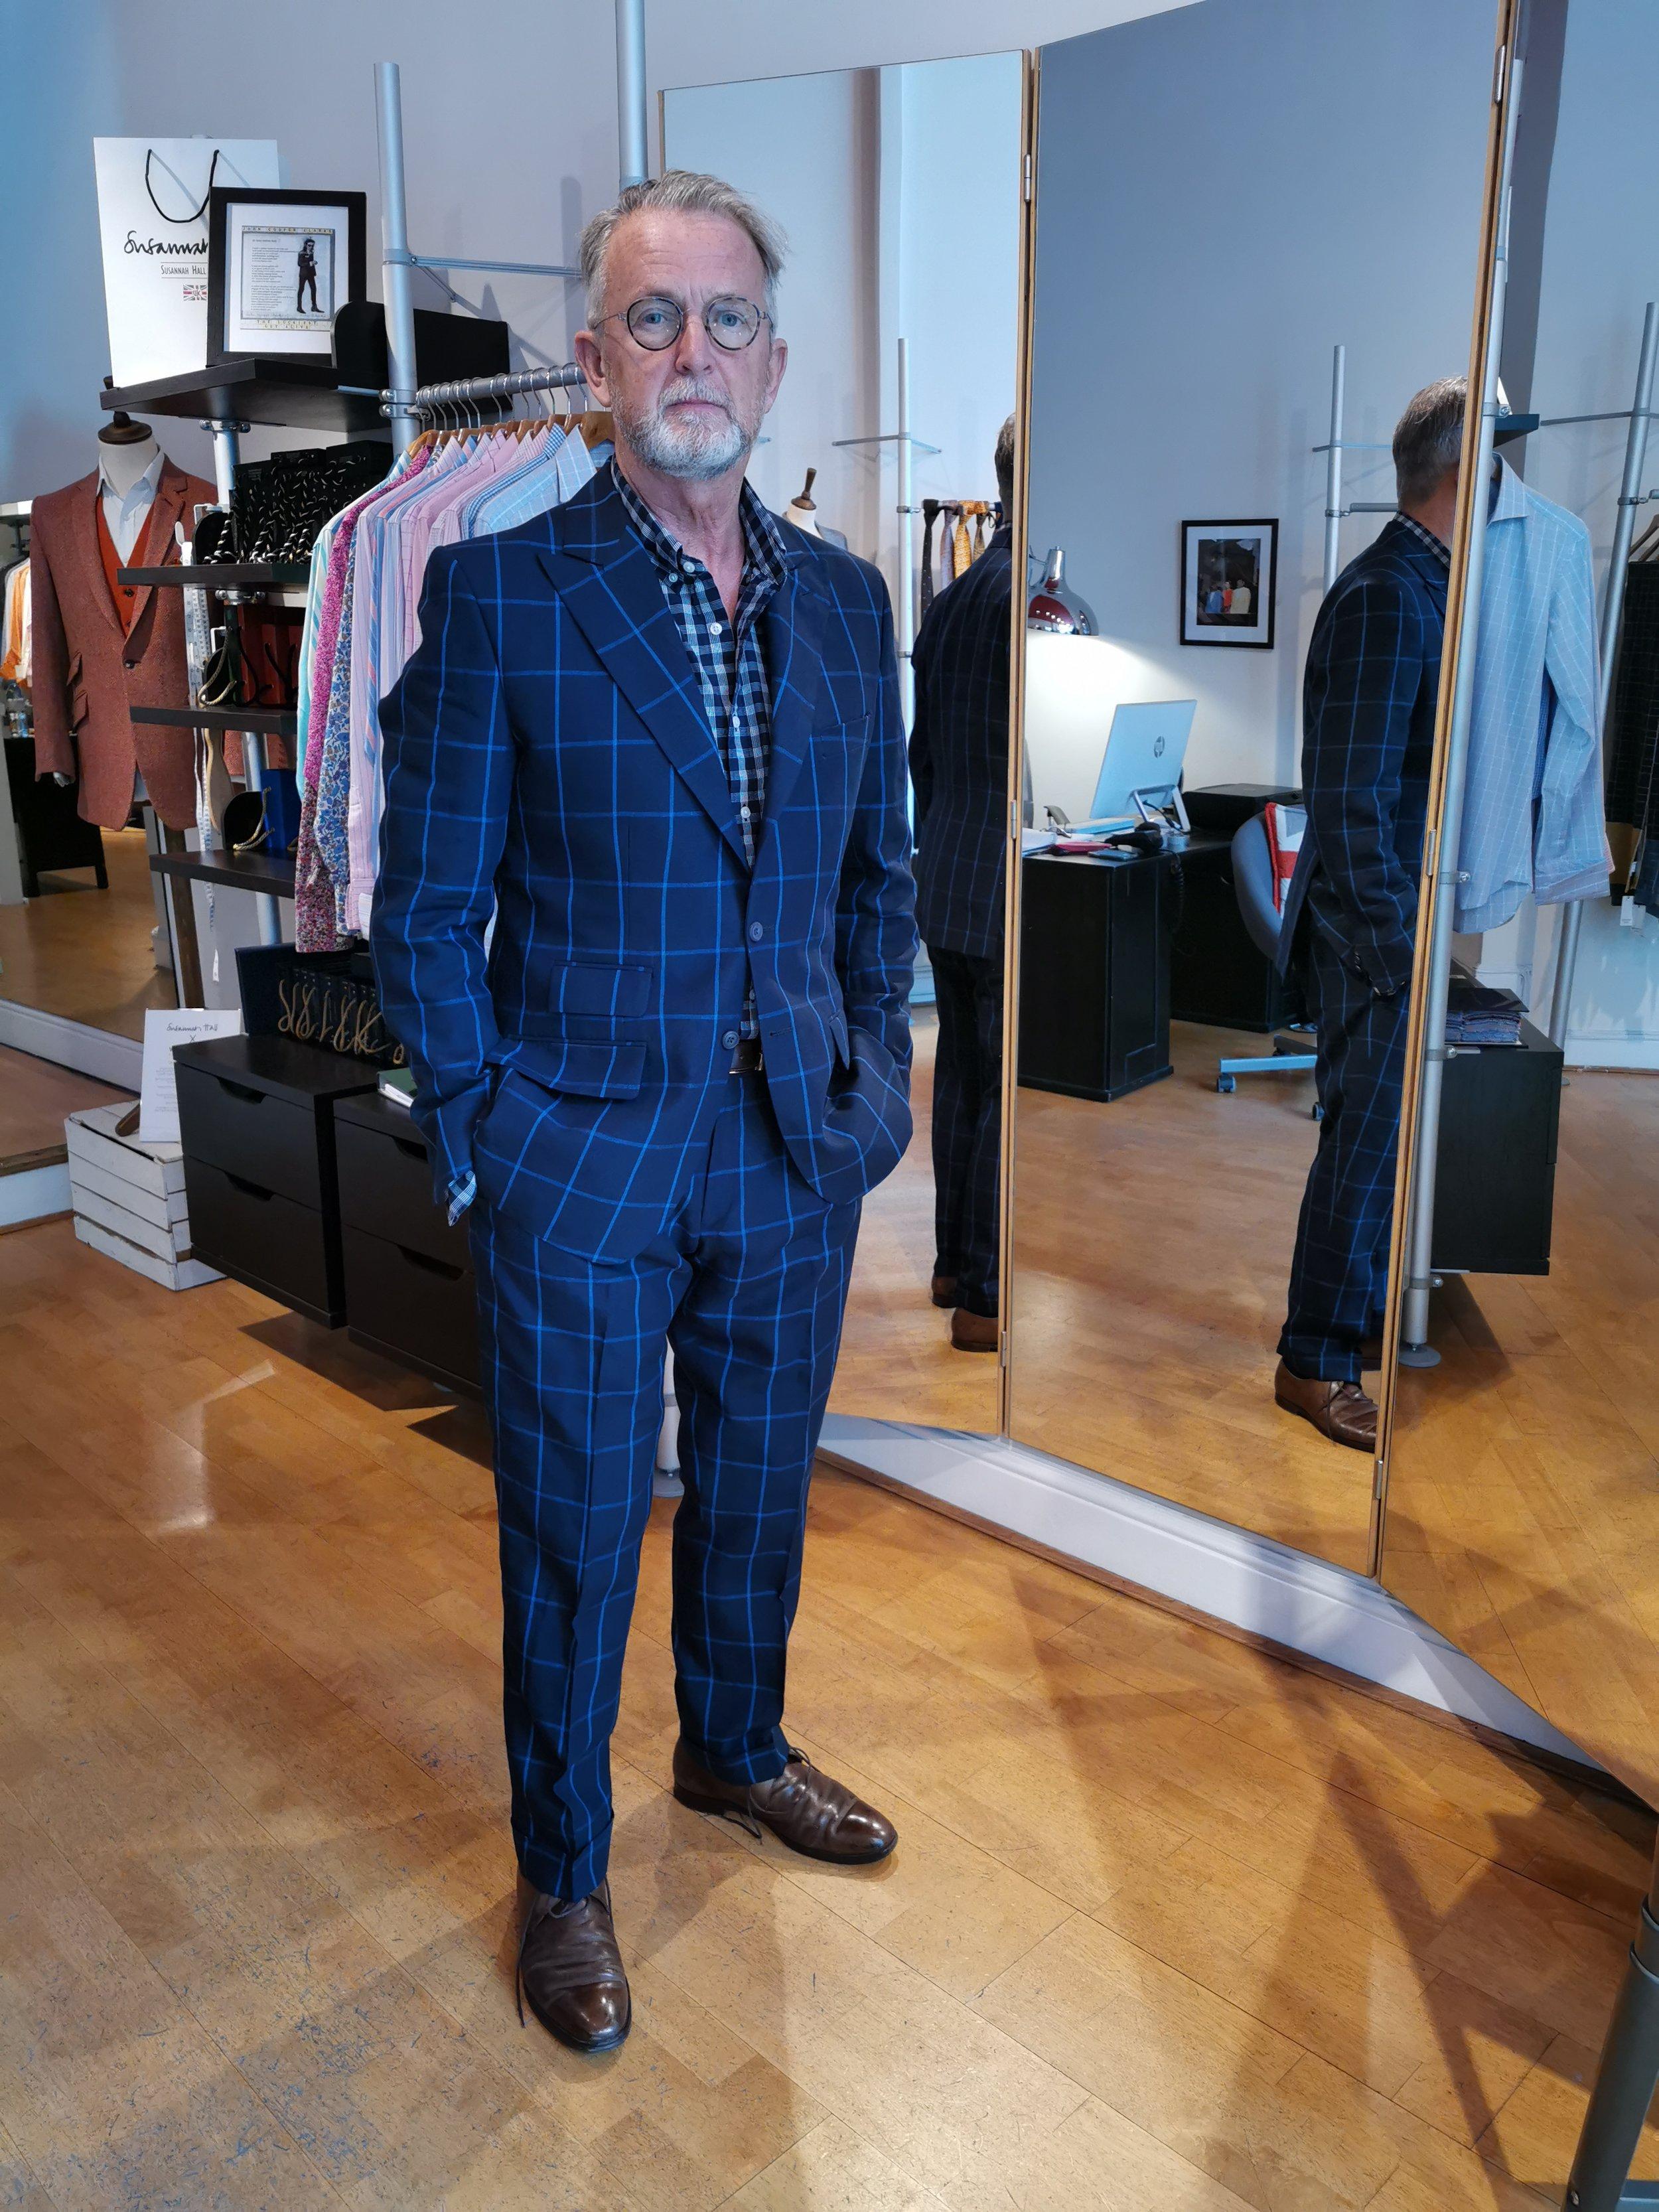 susannah-hall-linen-suit-bespoke-tailor-made-britain-uk-bateman-ogden.jpg